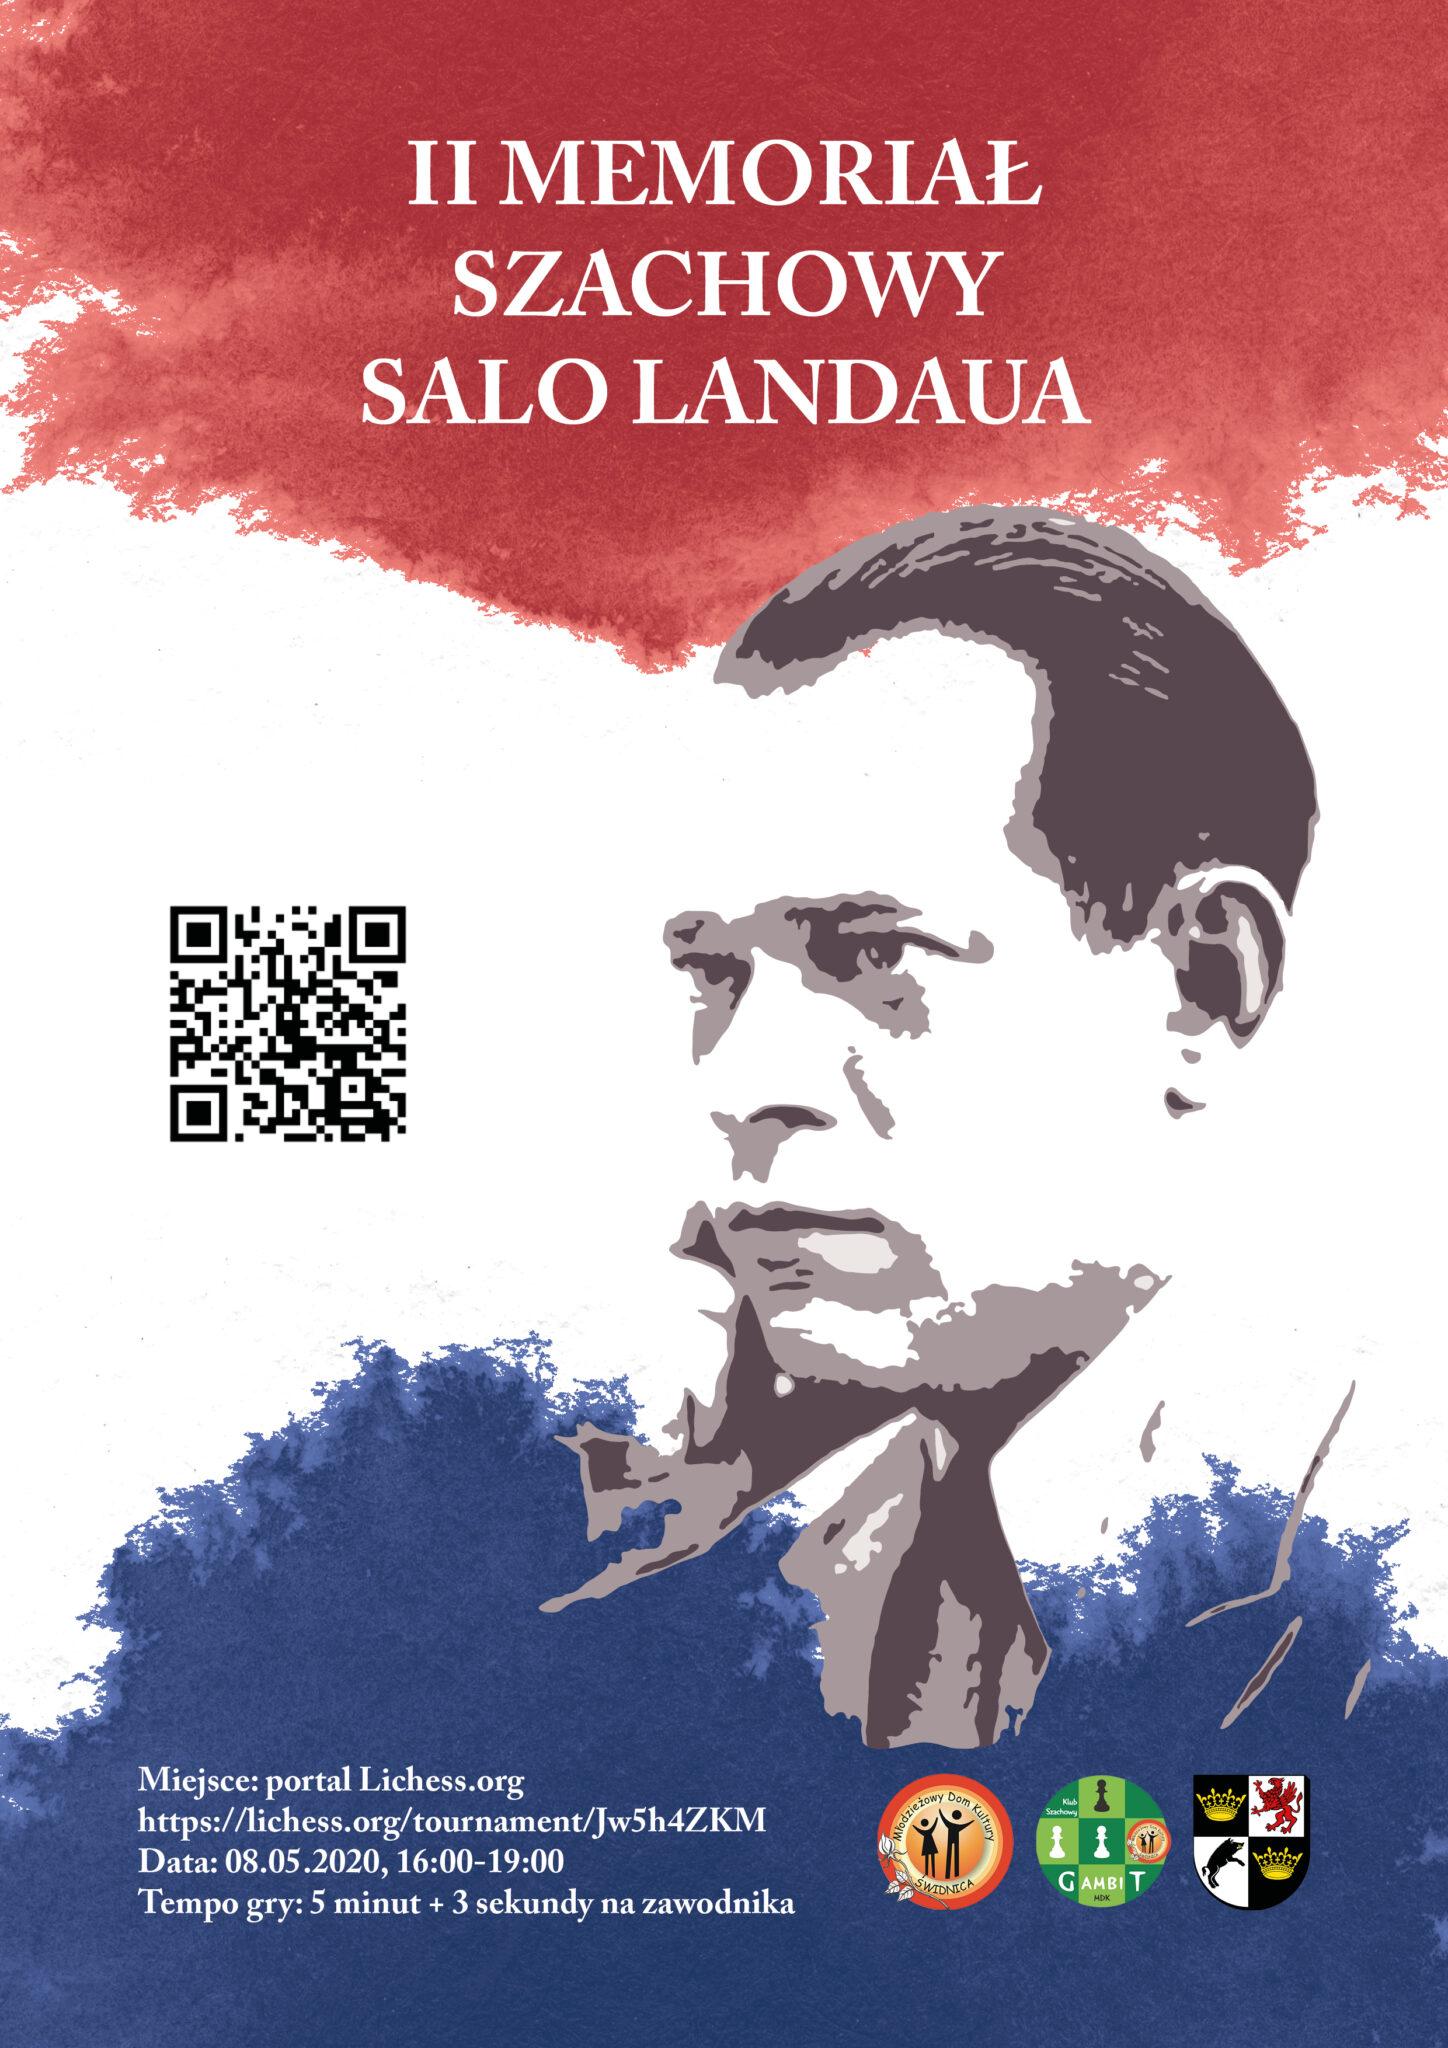 II memoriał szachowy Salo Landaua